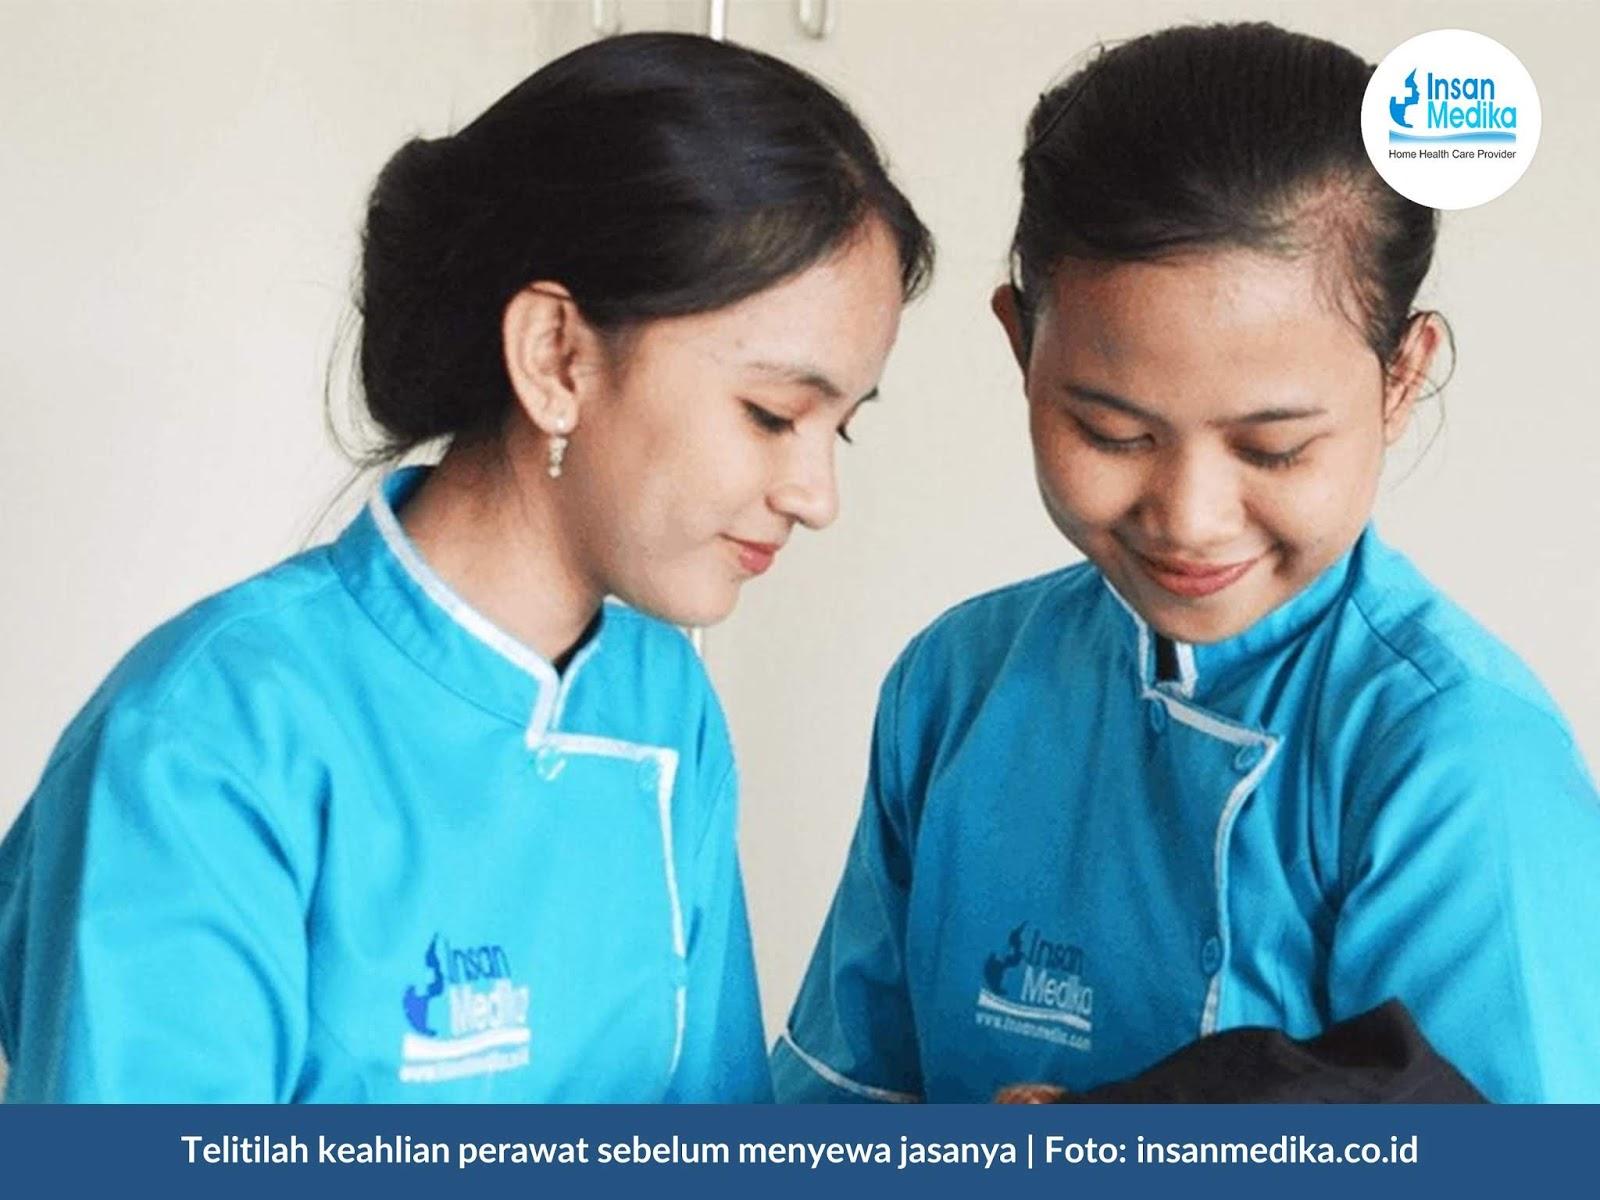 Adhi Nugroho Nodi Cari Jasa Perawat Home Care Terbaik Di Indonesia Pilih Insan Medika Saja